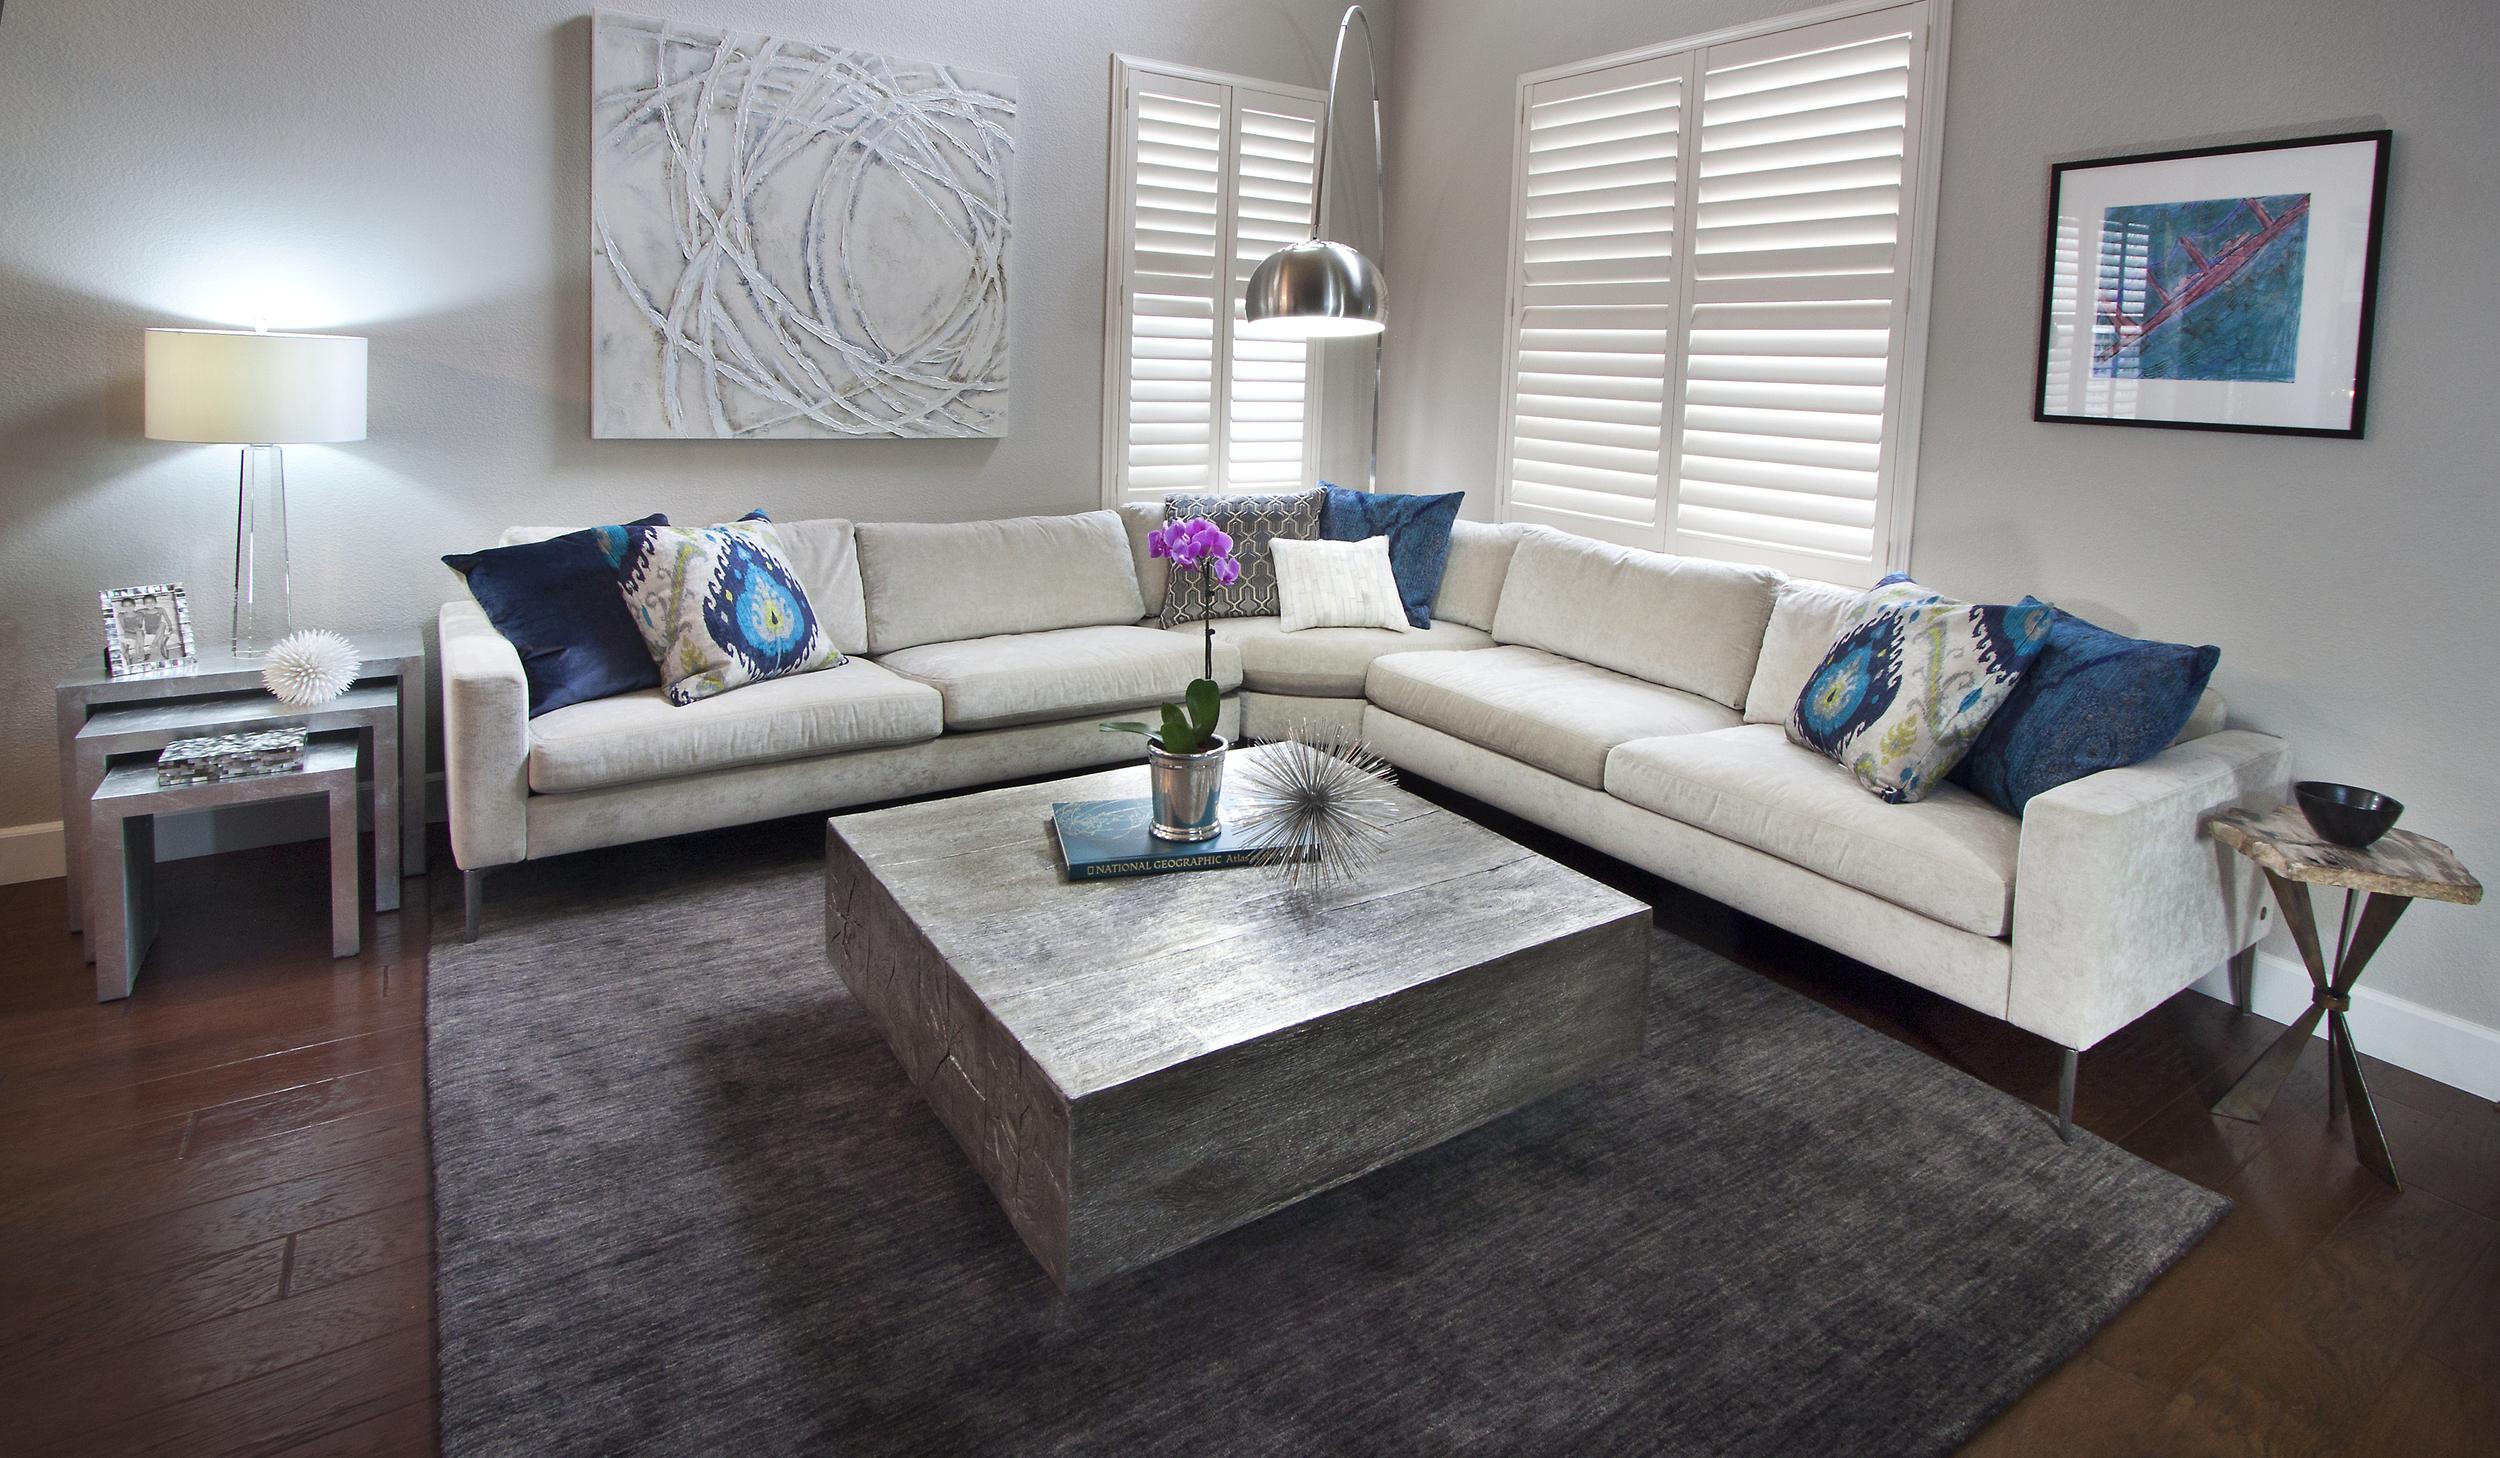 We design elegant, yet affordable spaces